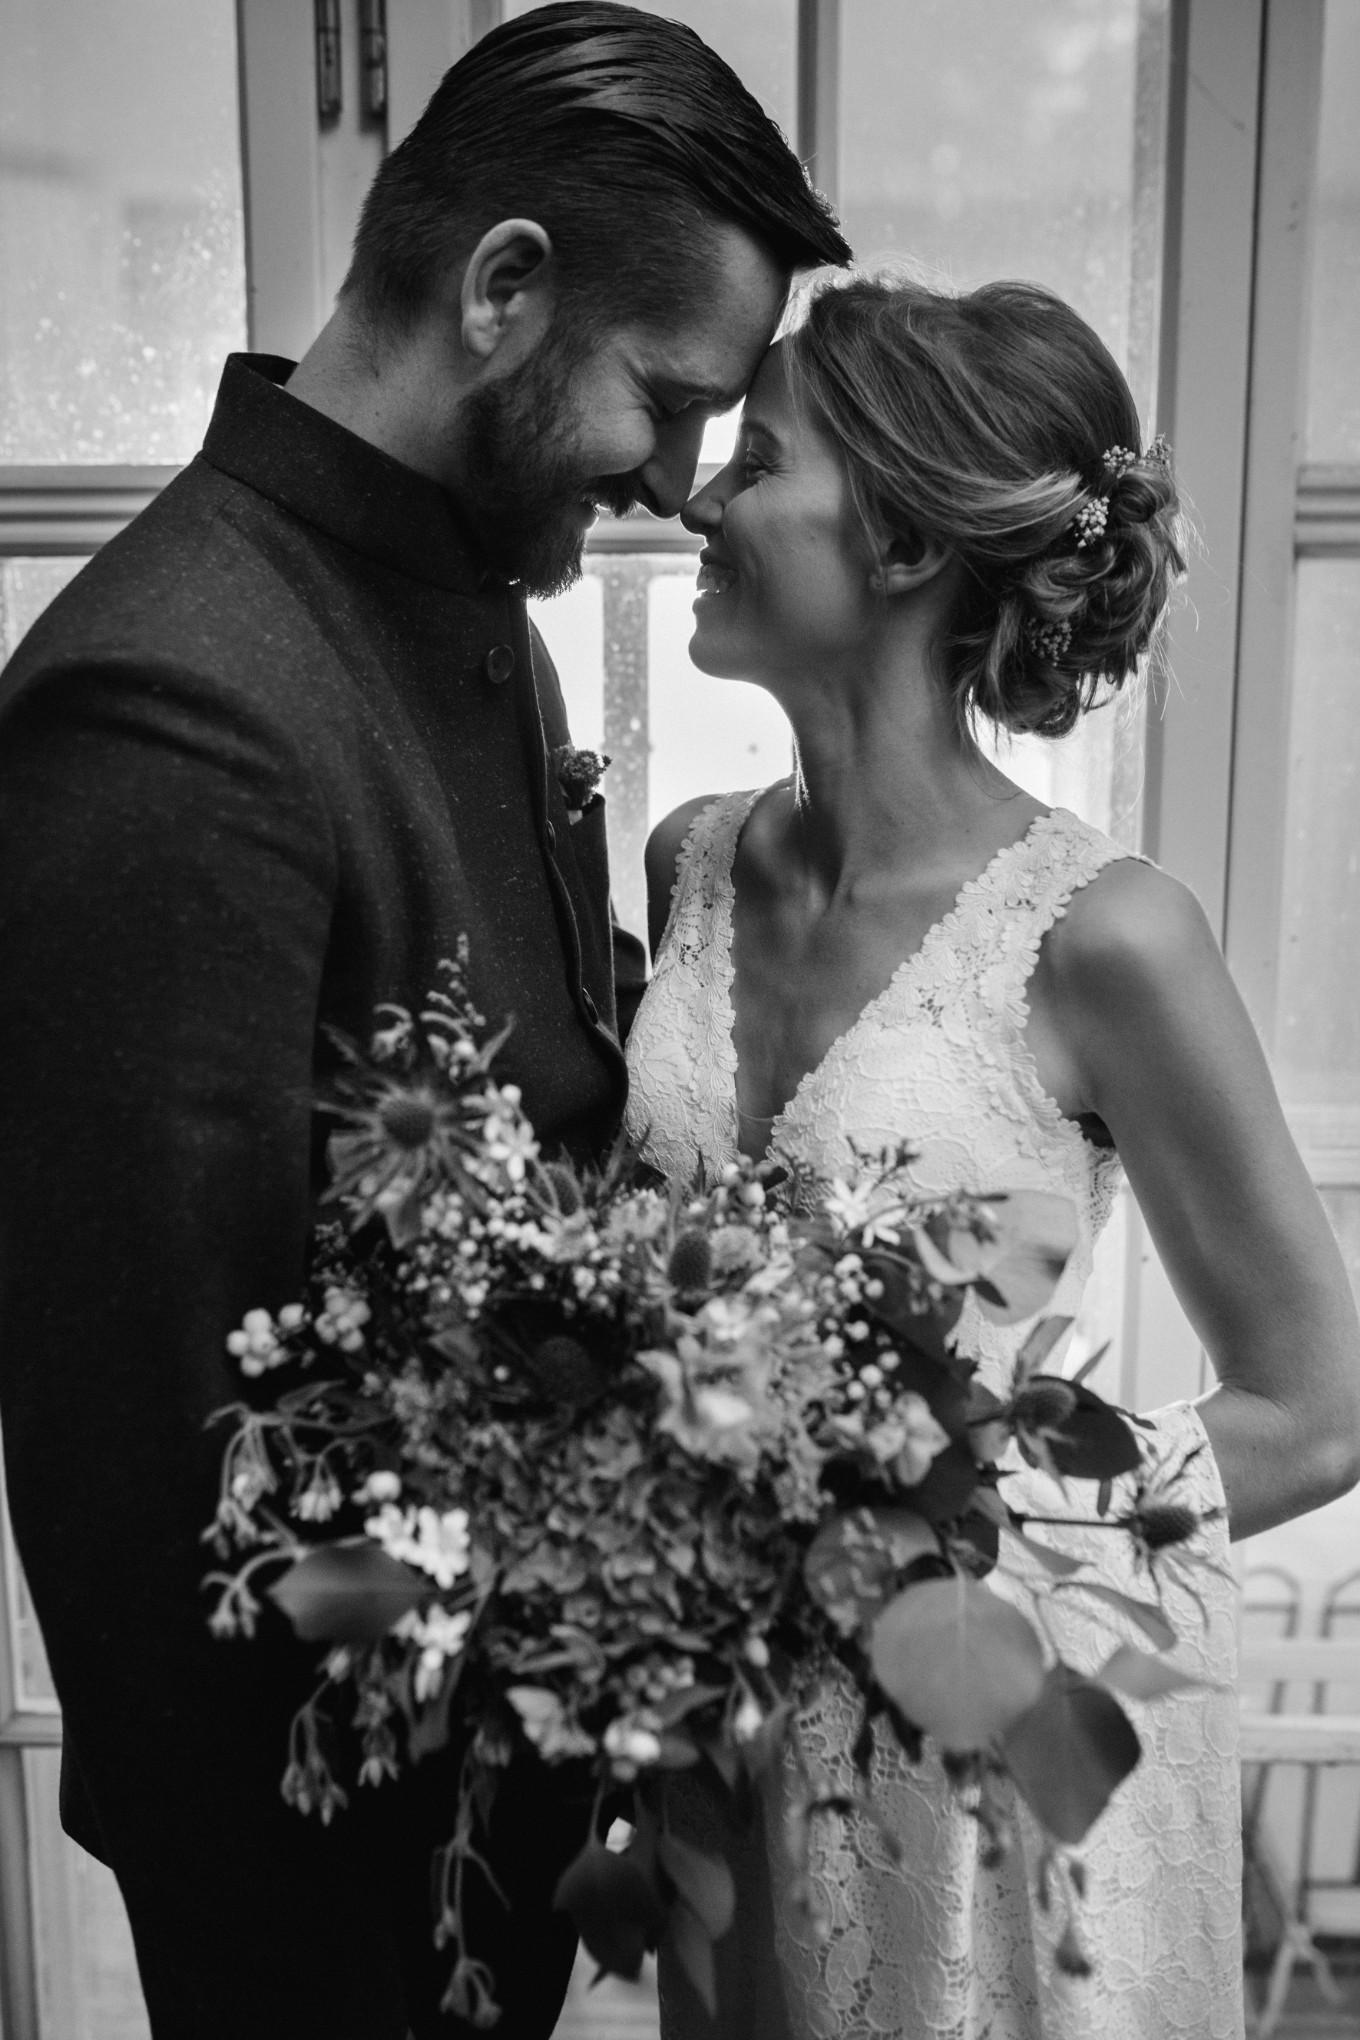 Berlin-Wannsee-Pia-Anna-Christian-Wedding-Photography-ST-87.jpg